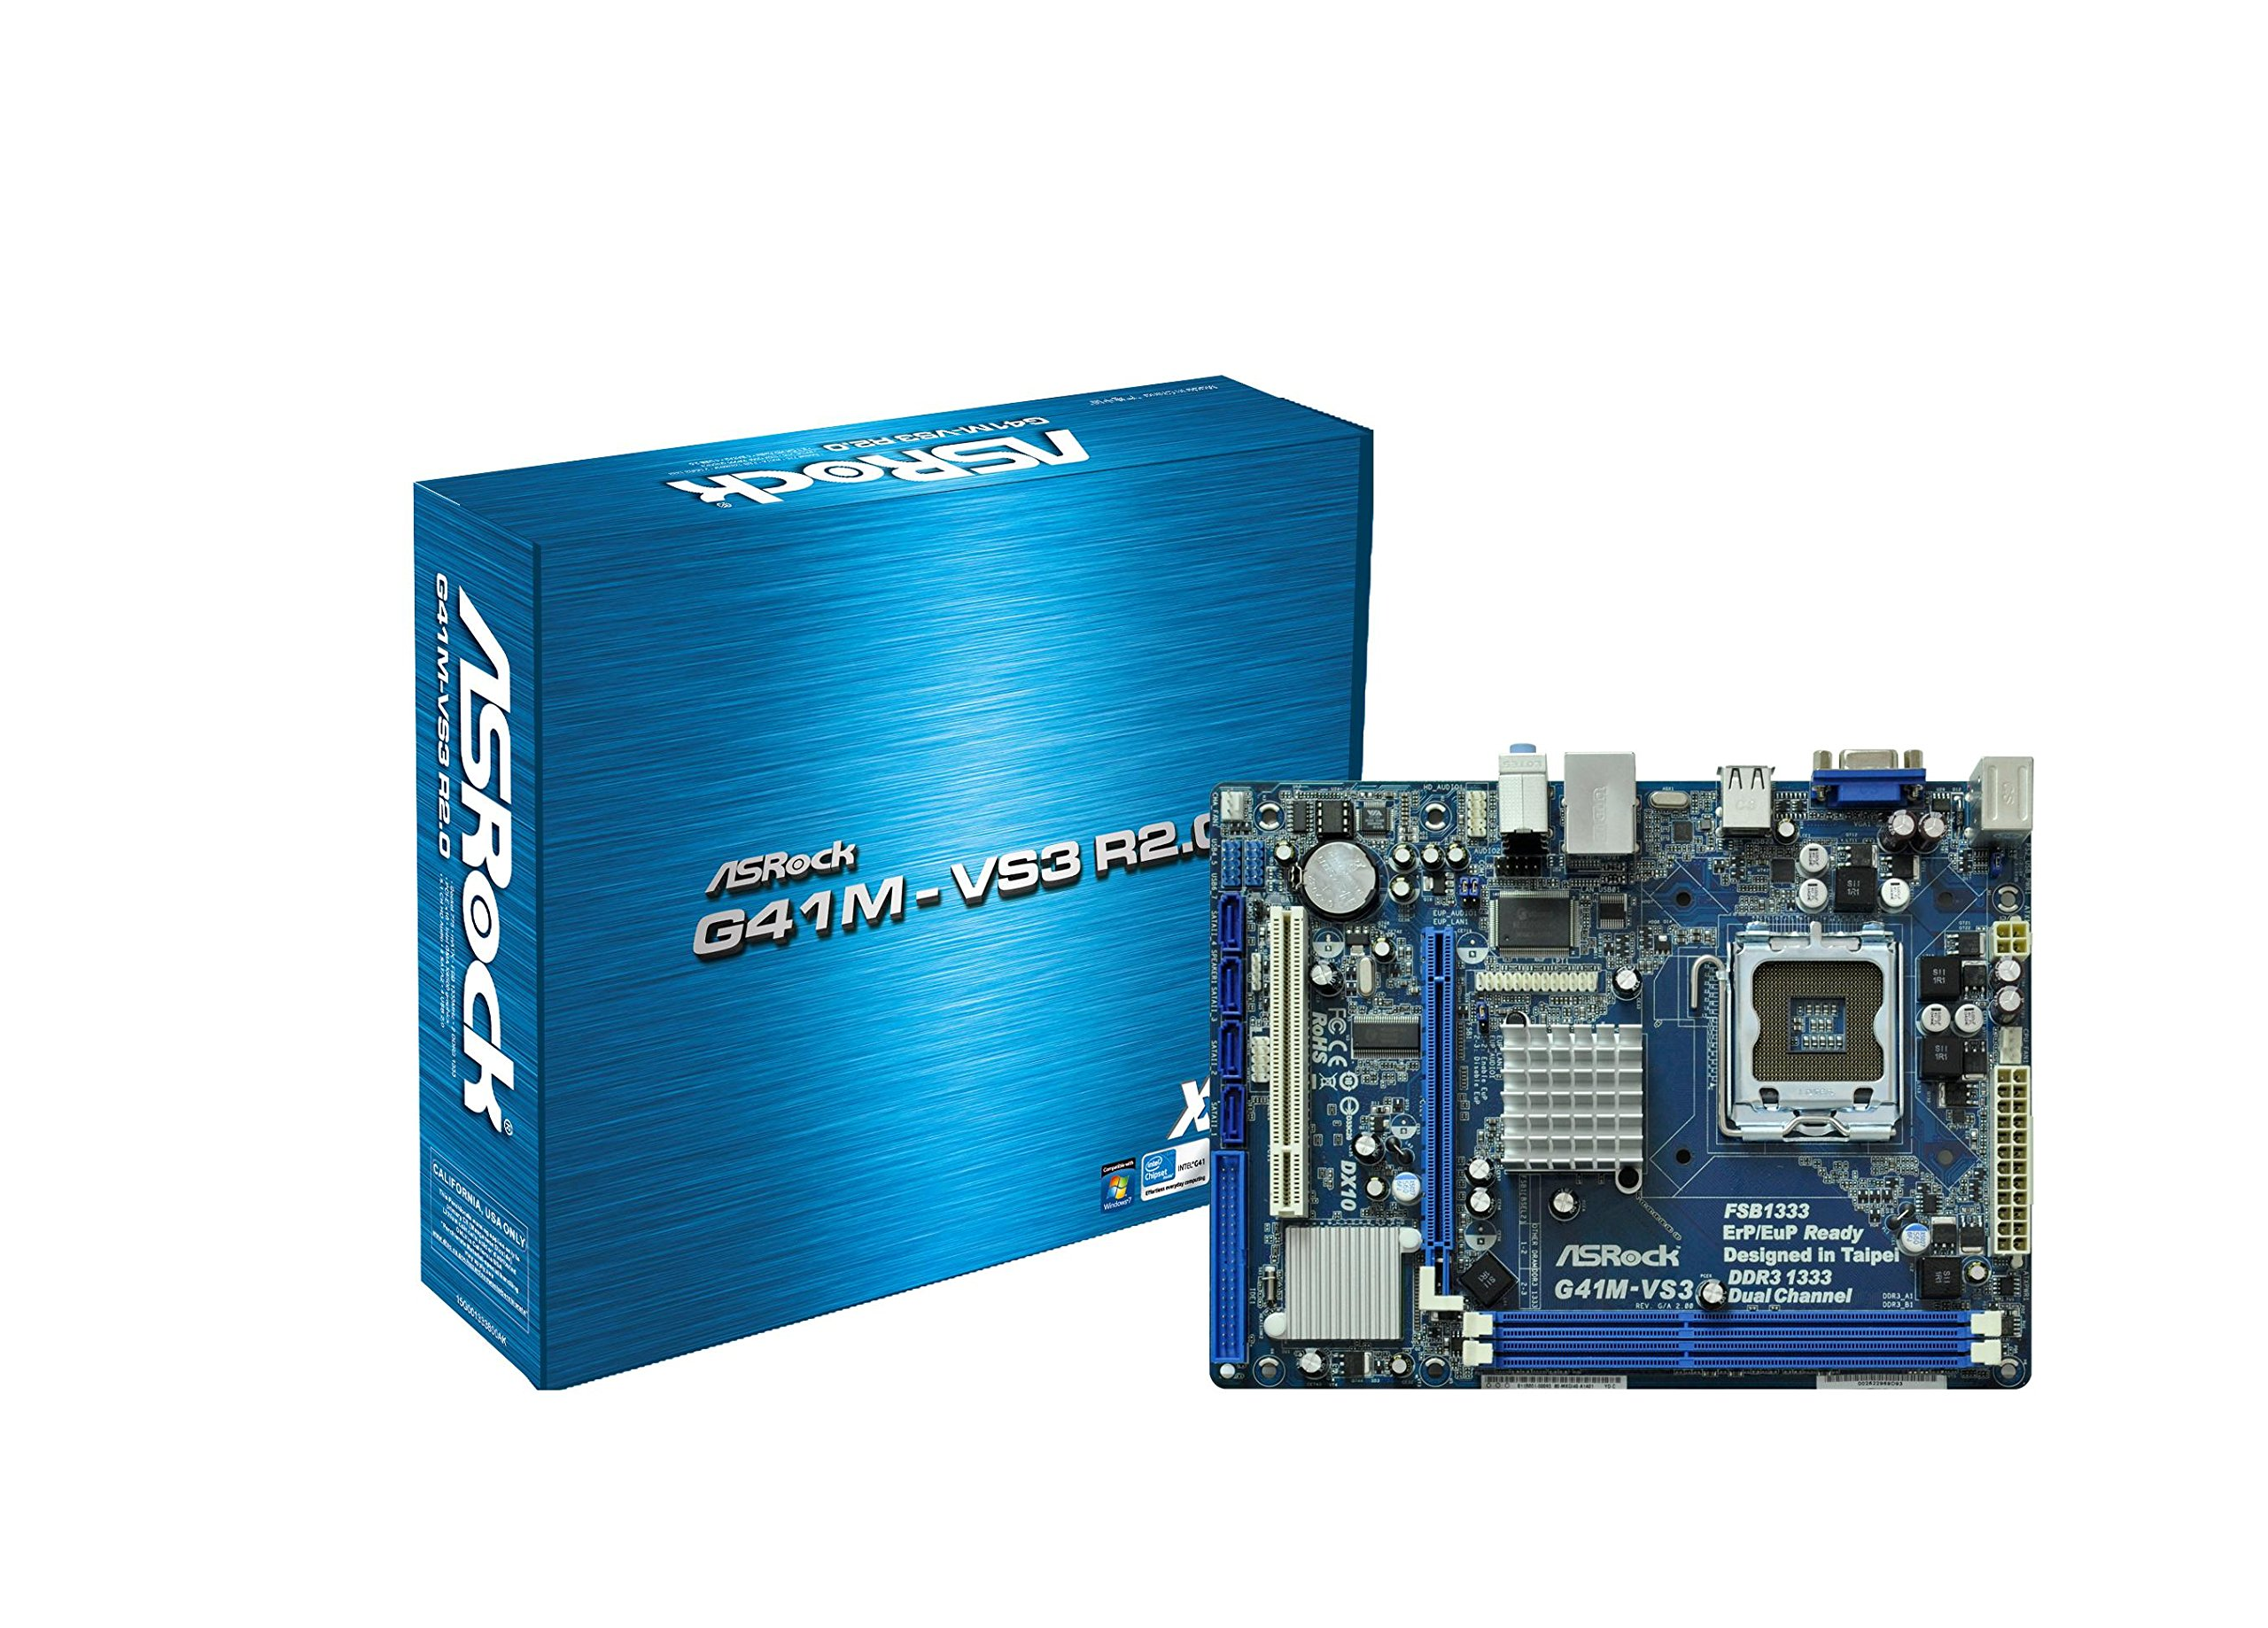 ASRock G41M-VS3 R2.0 Core 2 Quad/Intel G41/ DDR3/ A&V&L/Micro ATX LGA 755 Motherboard